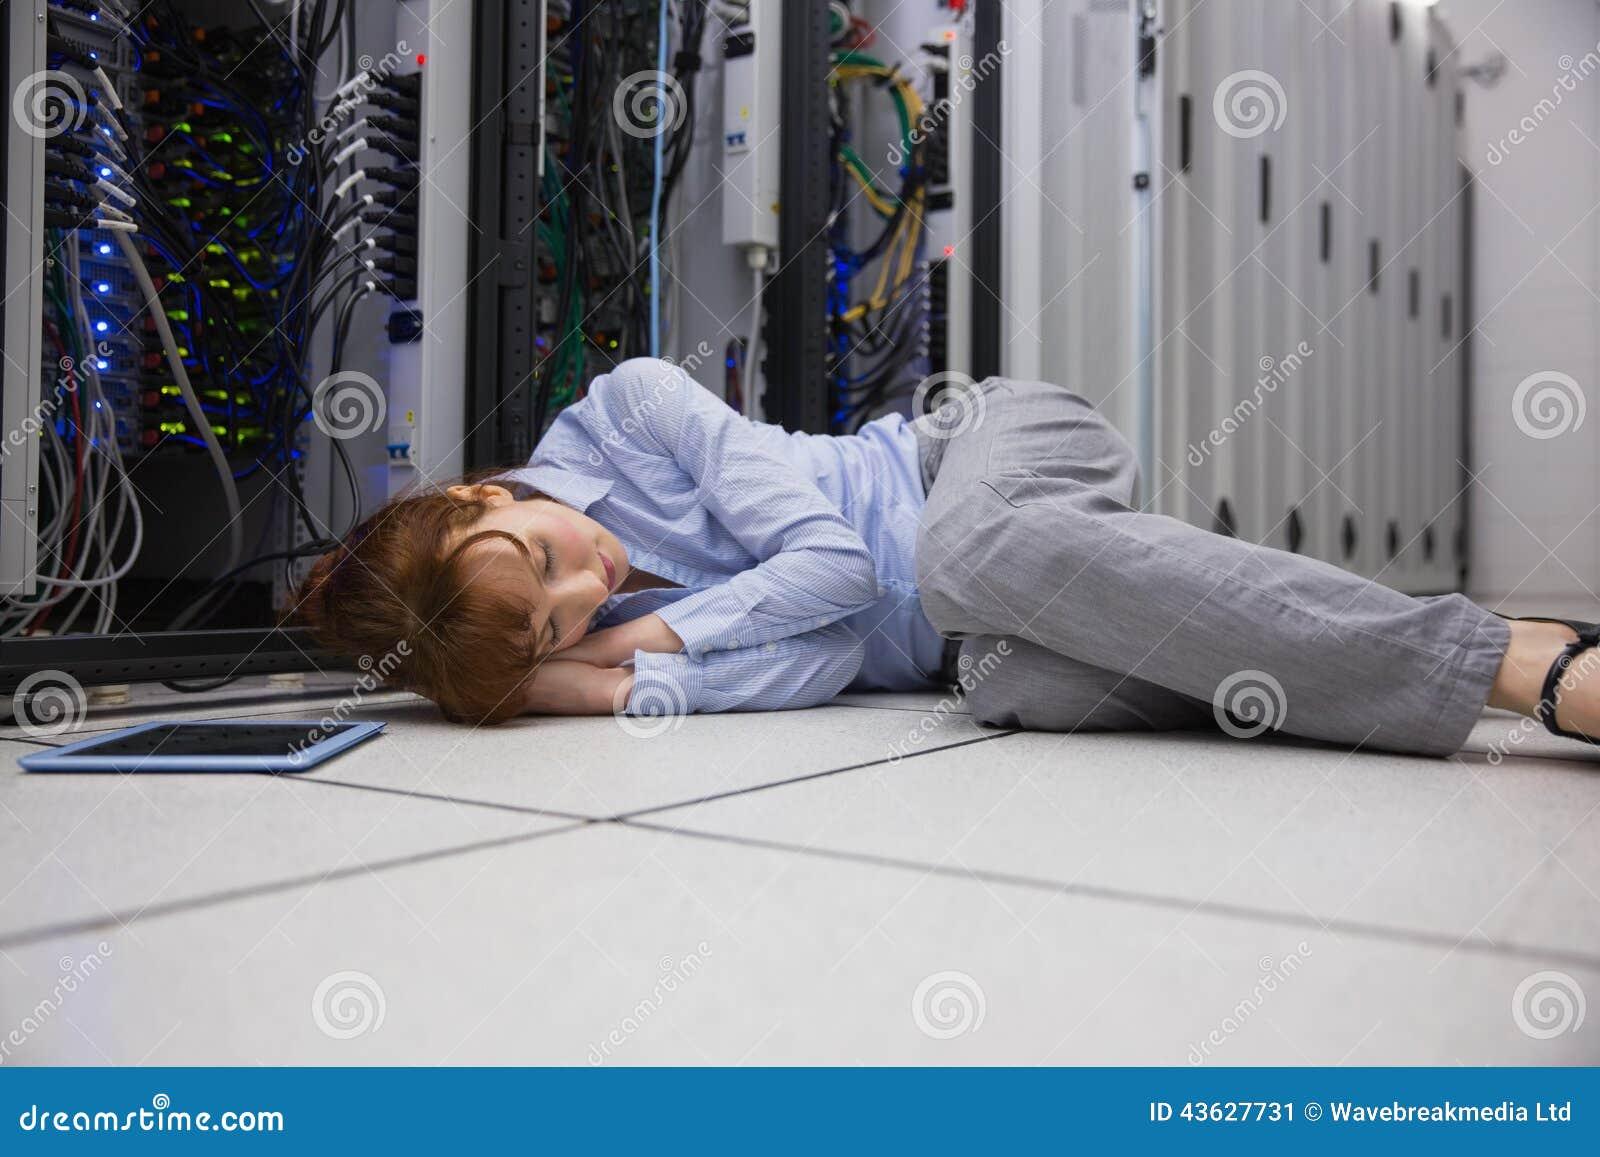 Exhausted technician sleeping on the floor stock photo for Is sleeping on the floor good